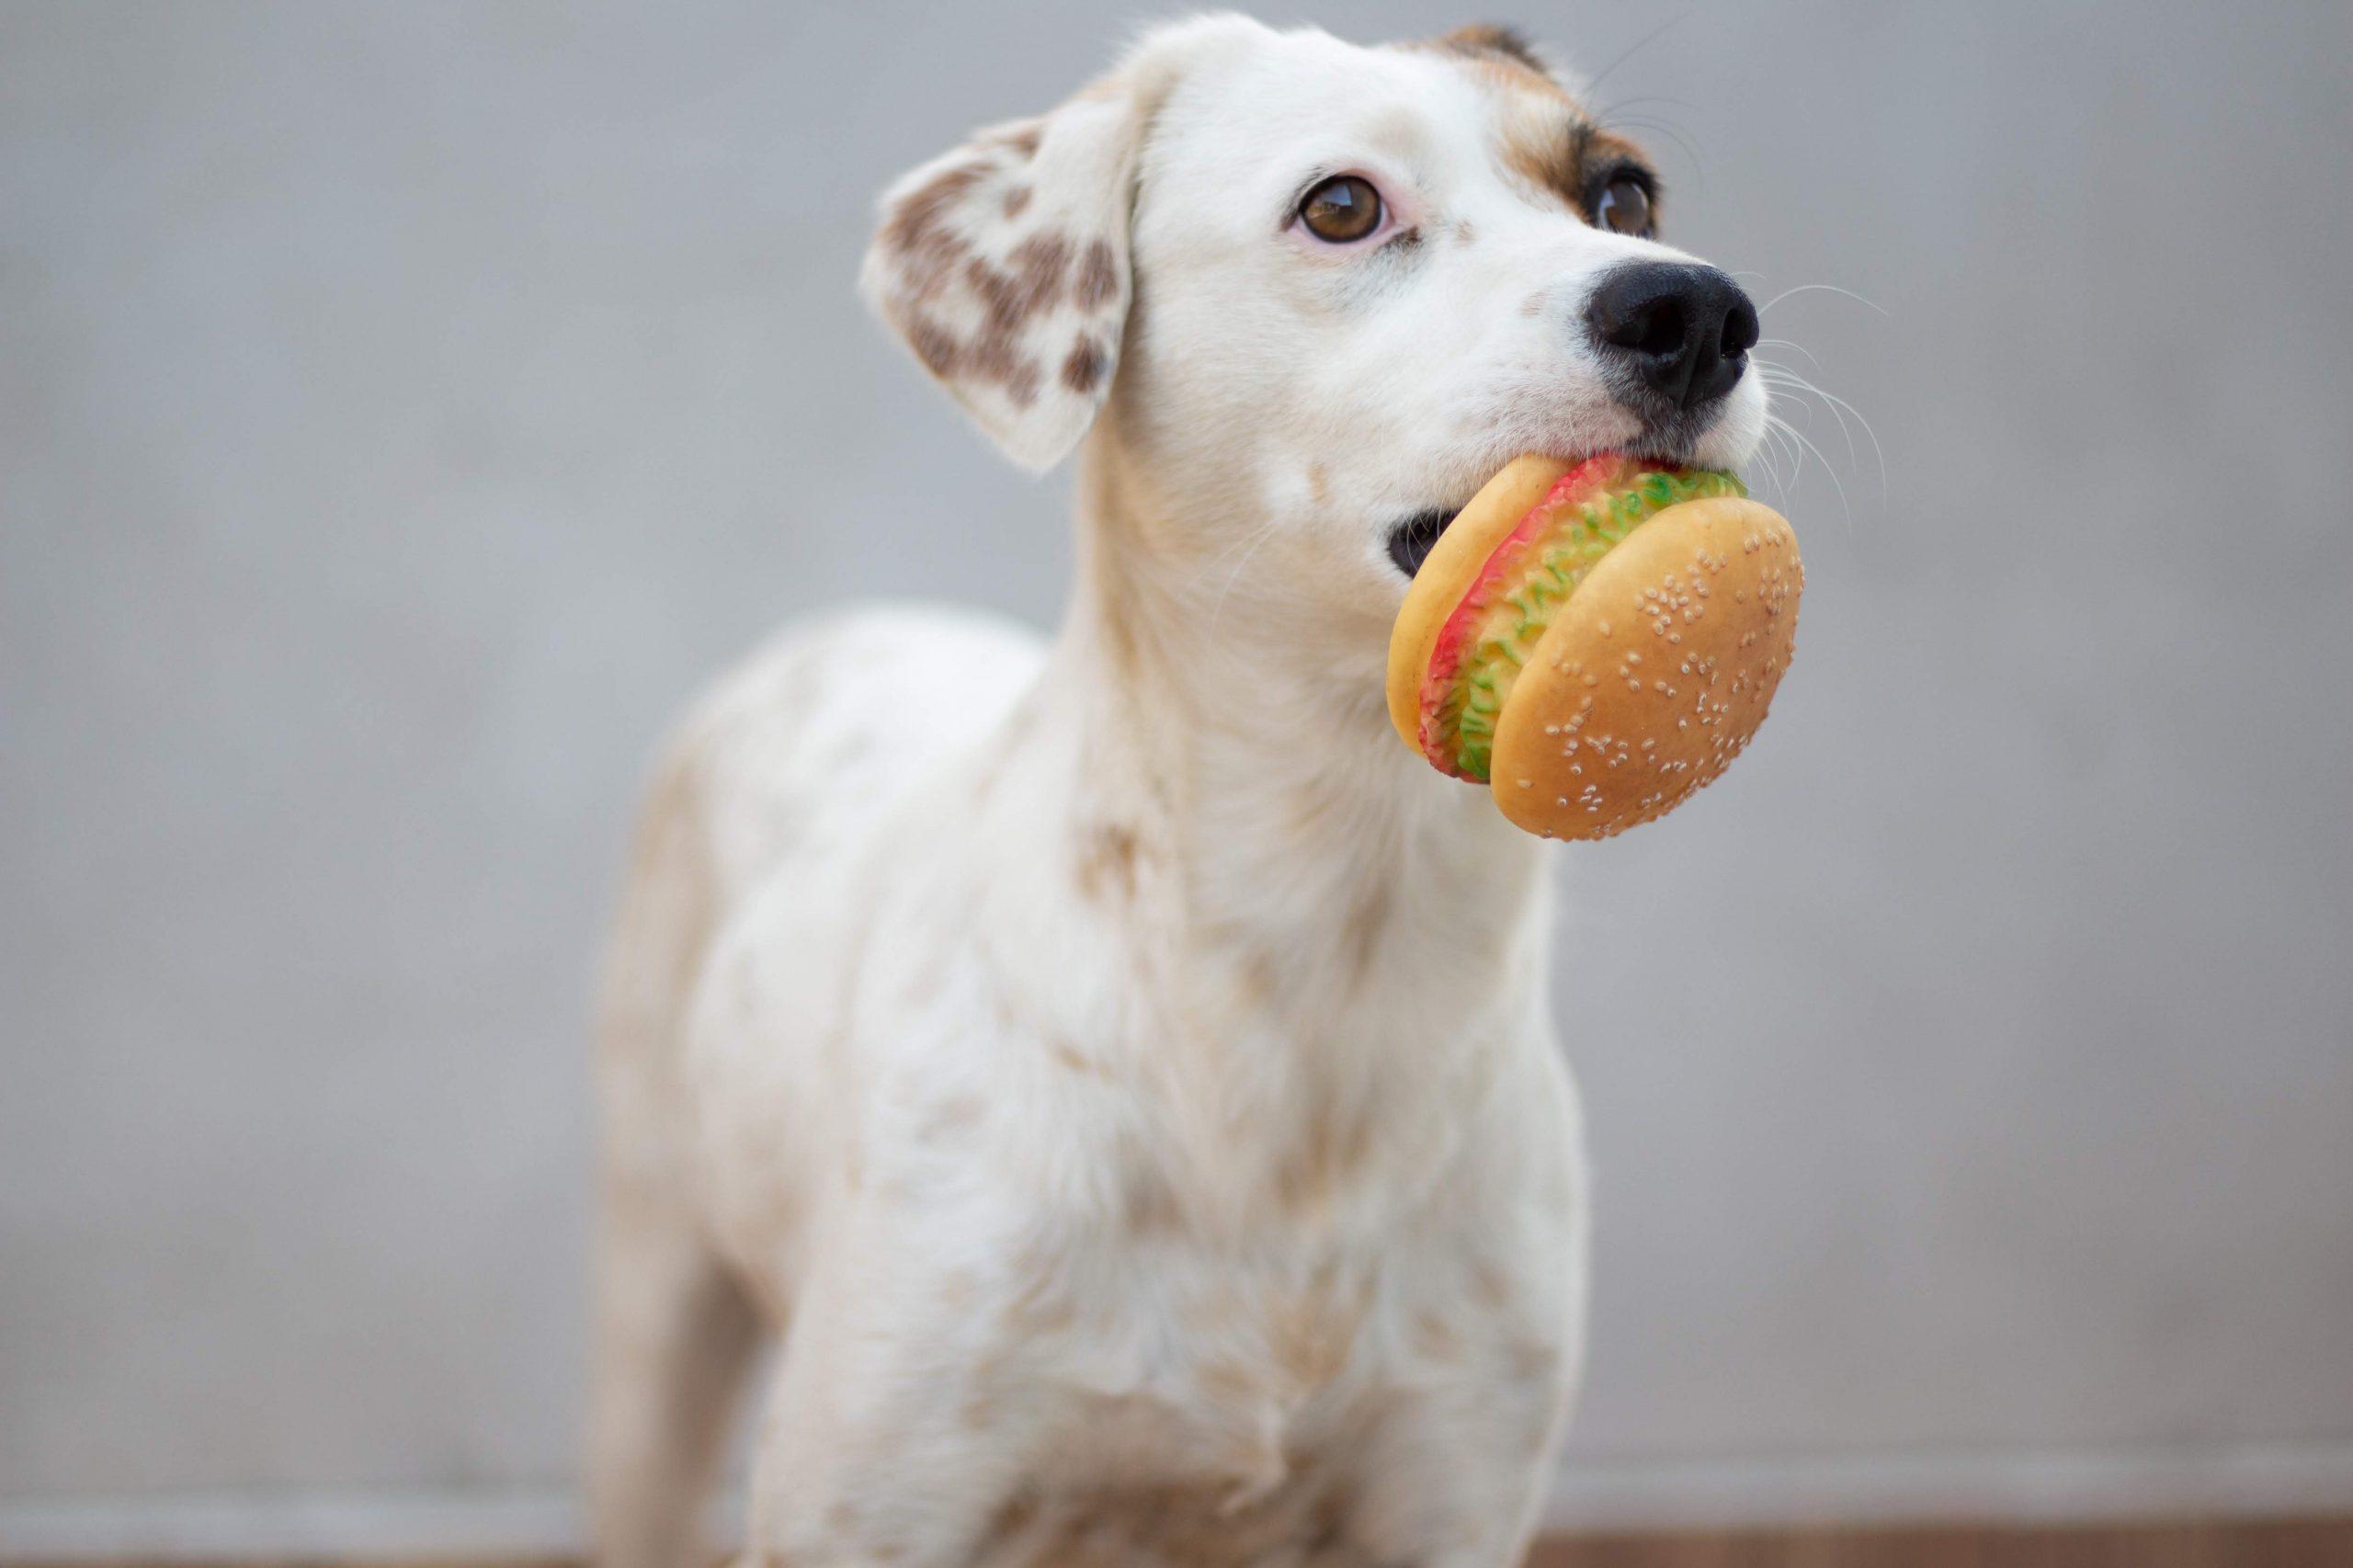 perro con hamburguesa de juguete